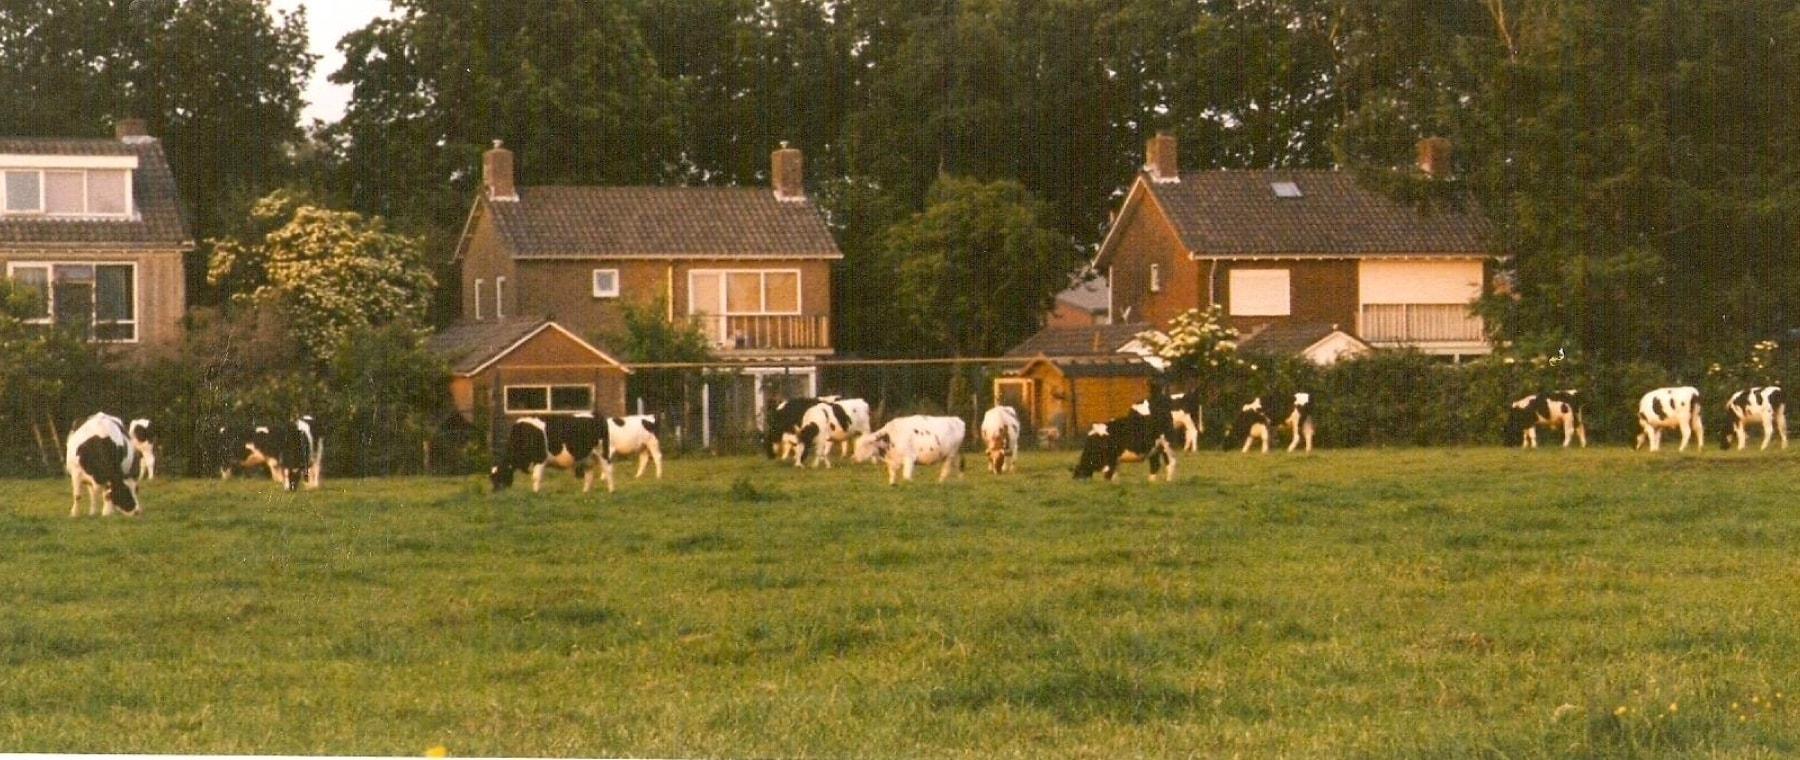 Vroeger stonden er koeien